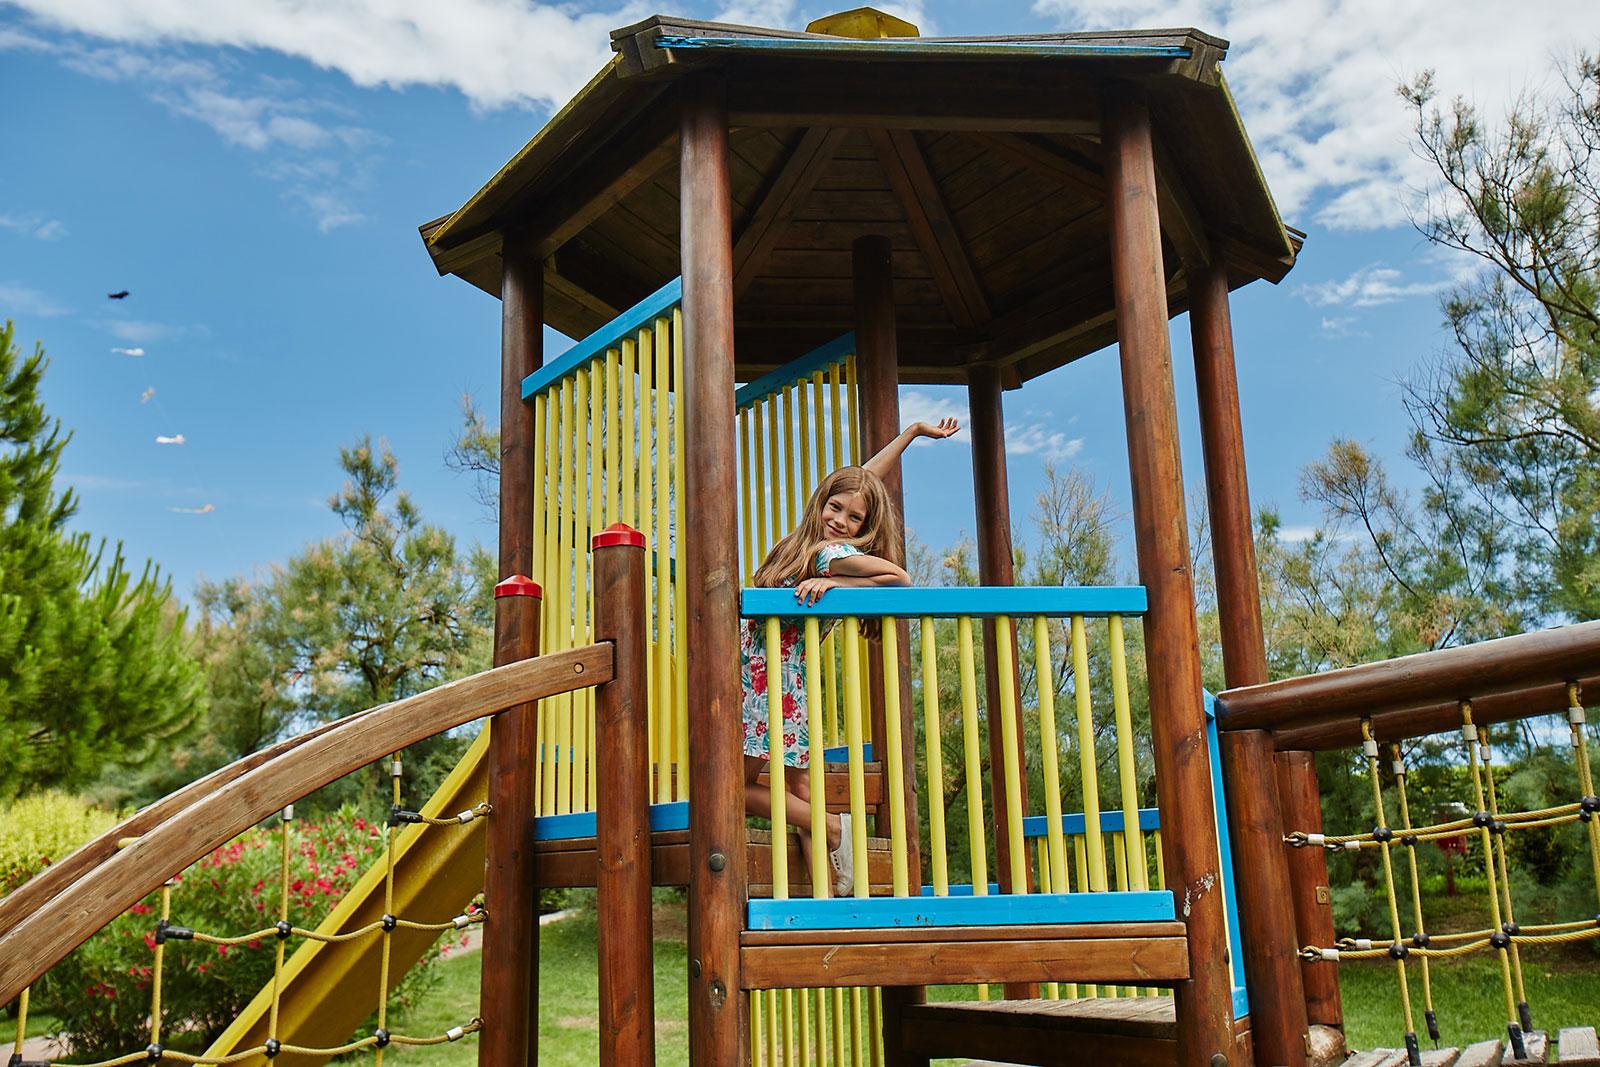 Children's-Playground-Camping-Village-Dei-Fiori